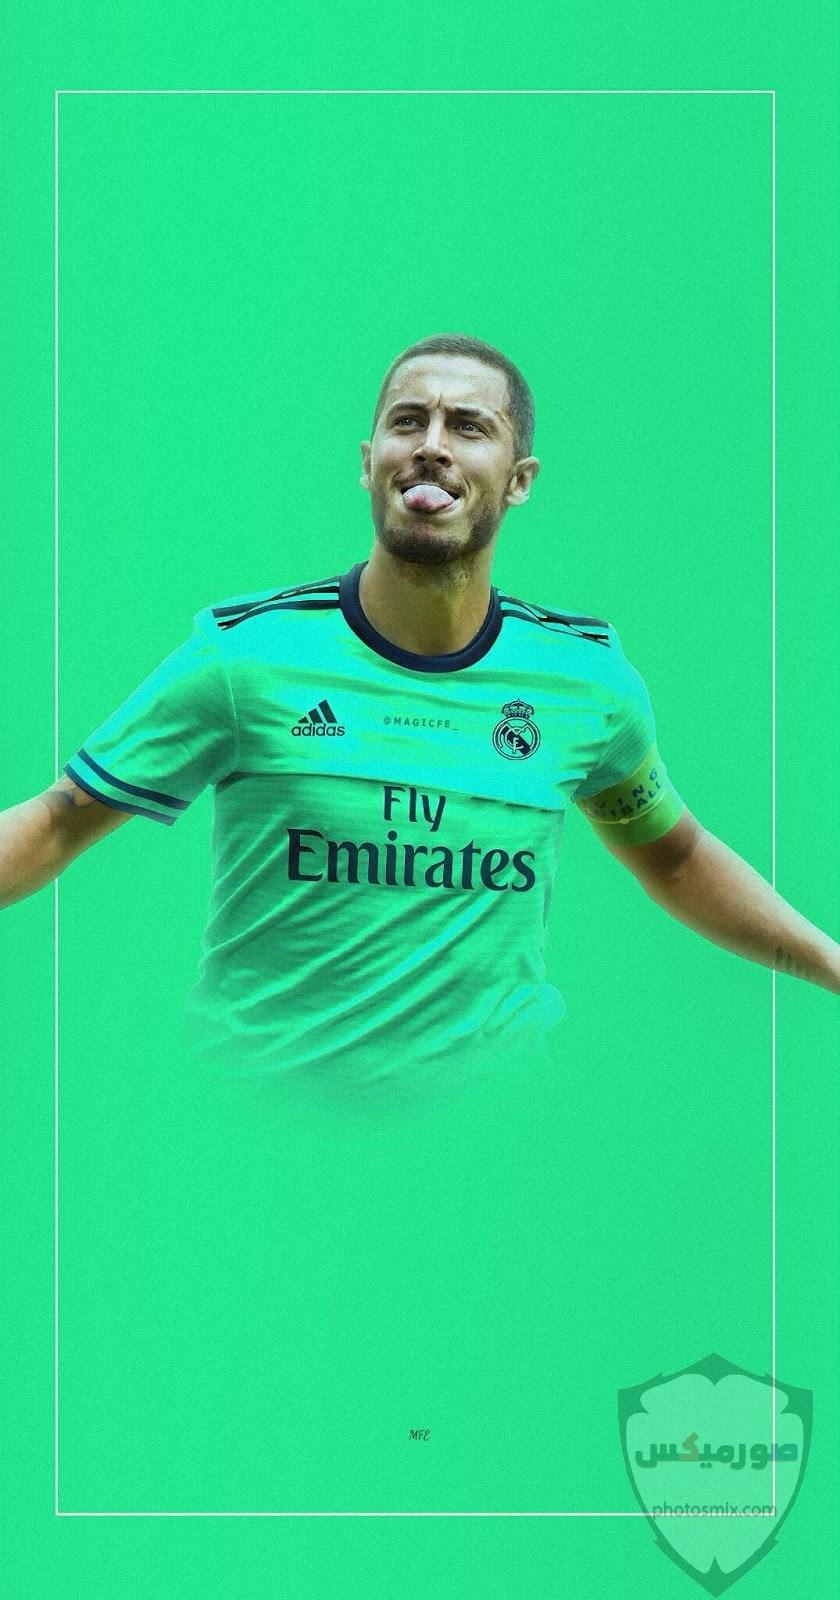 صور ريال مدريد 2020خلفيات ورمزيات ريال مدريد صور لاعبي ريال مدريد real madrid 8